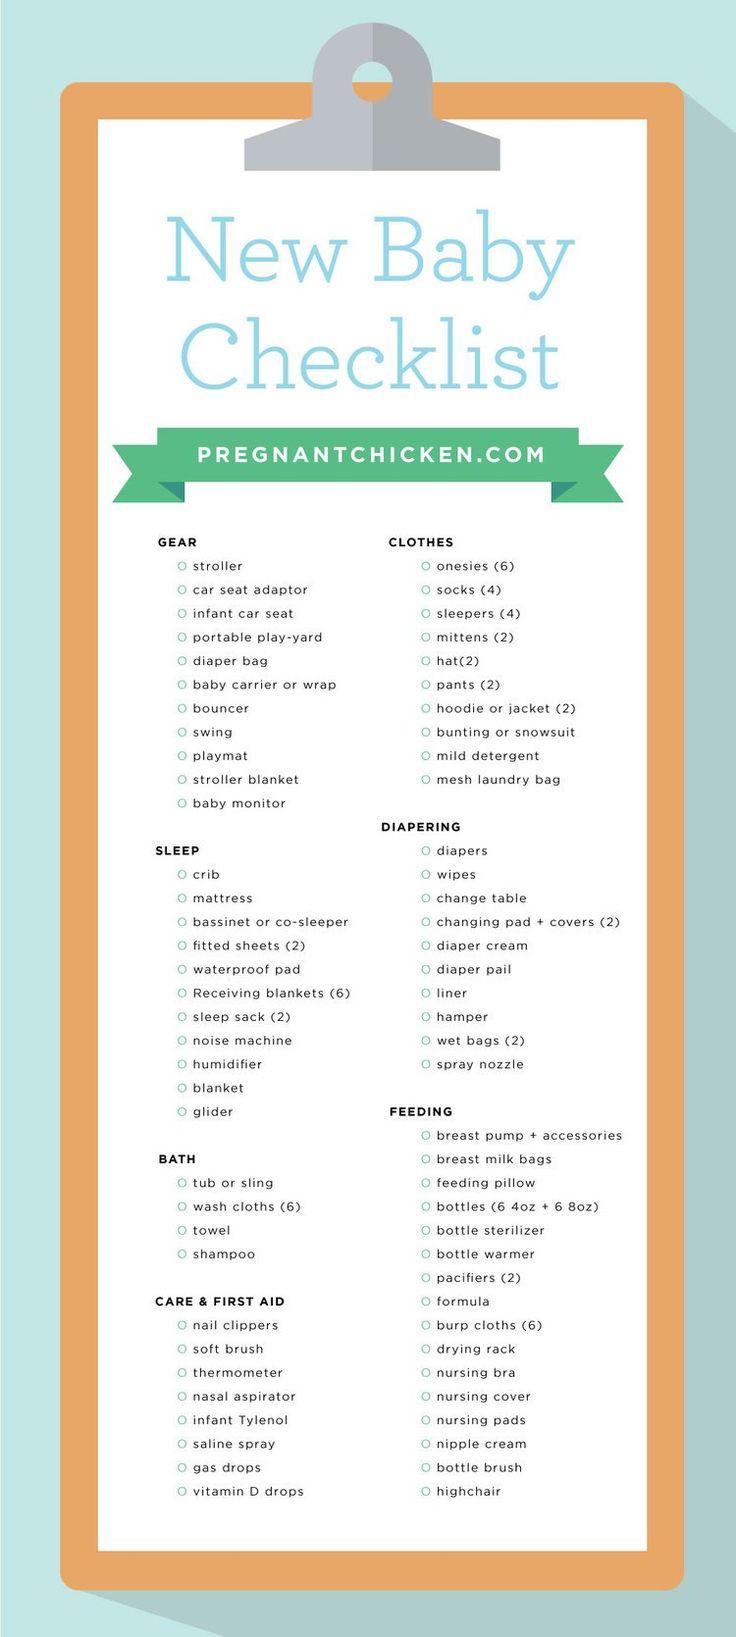 new baby checklist what to get when expecting bb nouveaux b b s tipi bebe et liste de